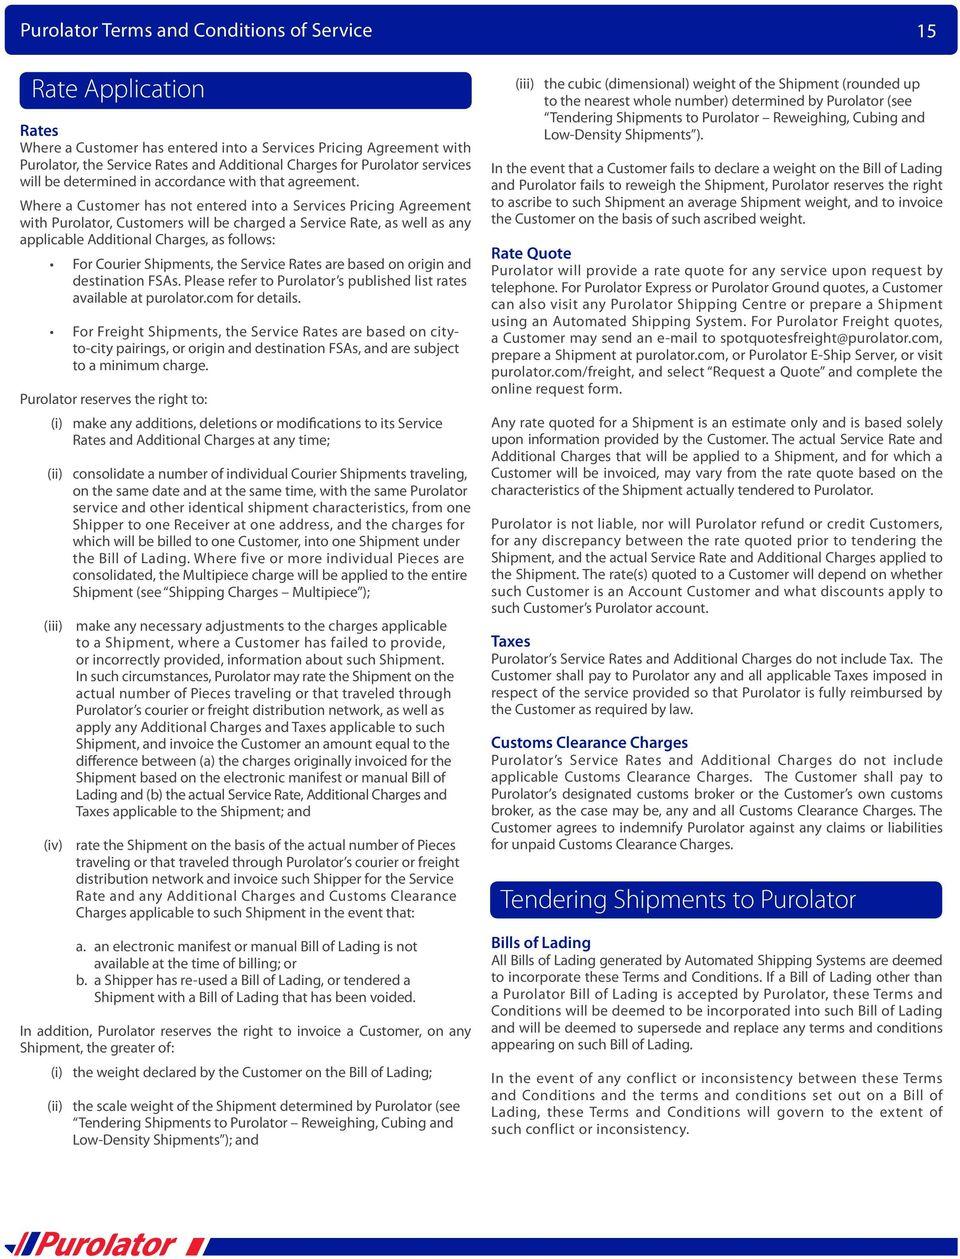 Purolator Freight Bill Of Lading Form